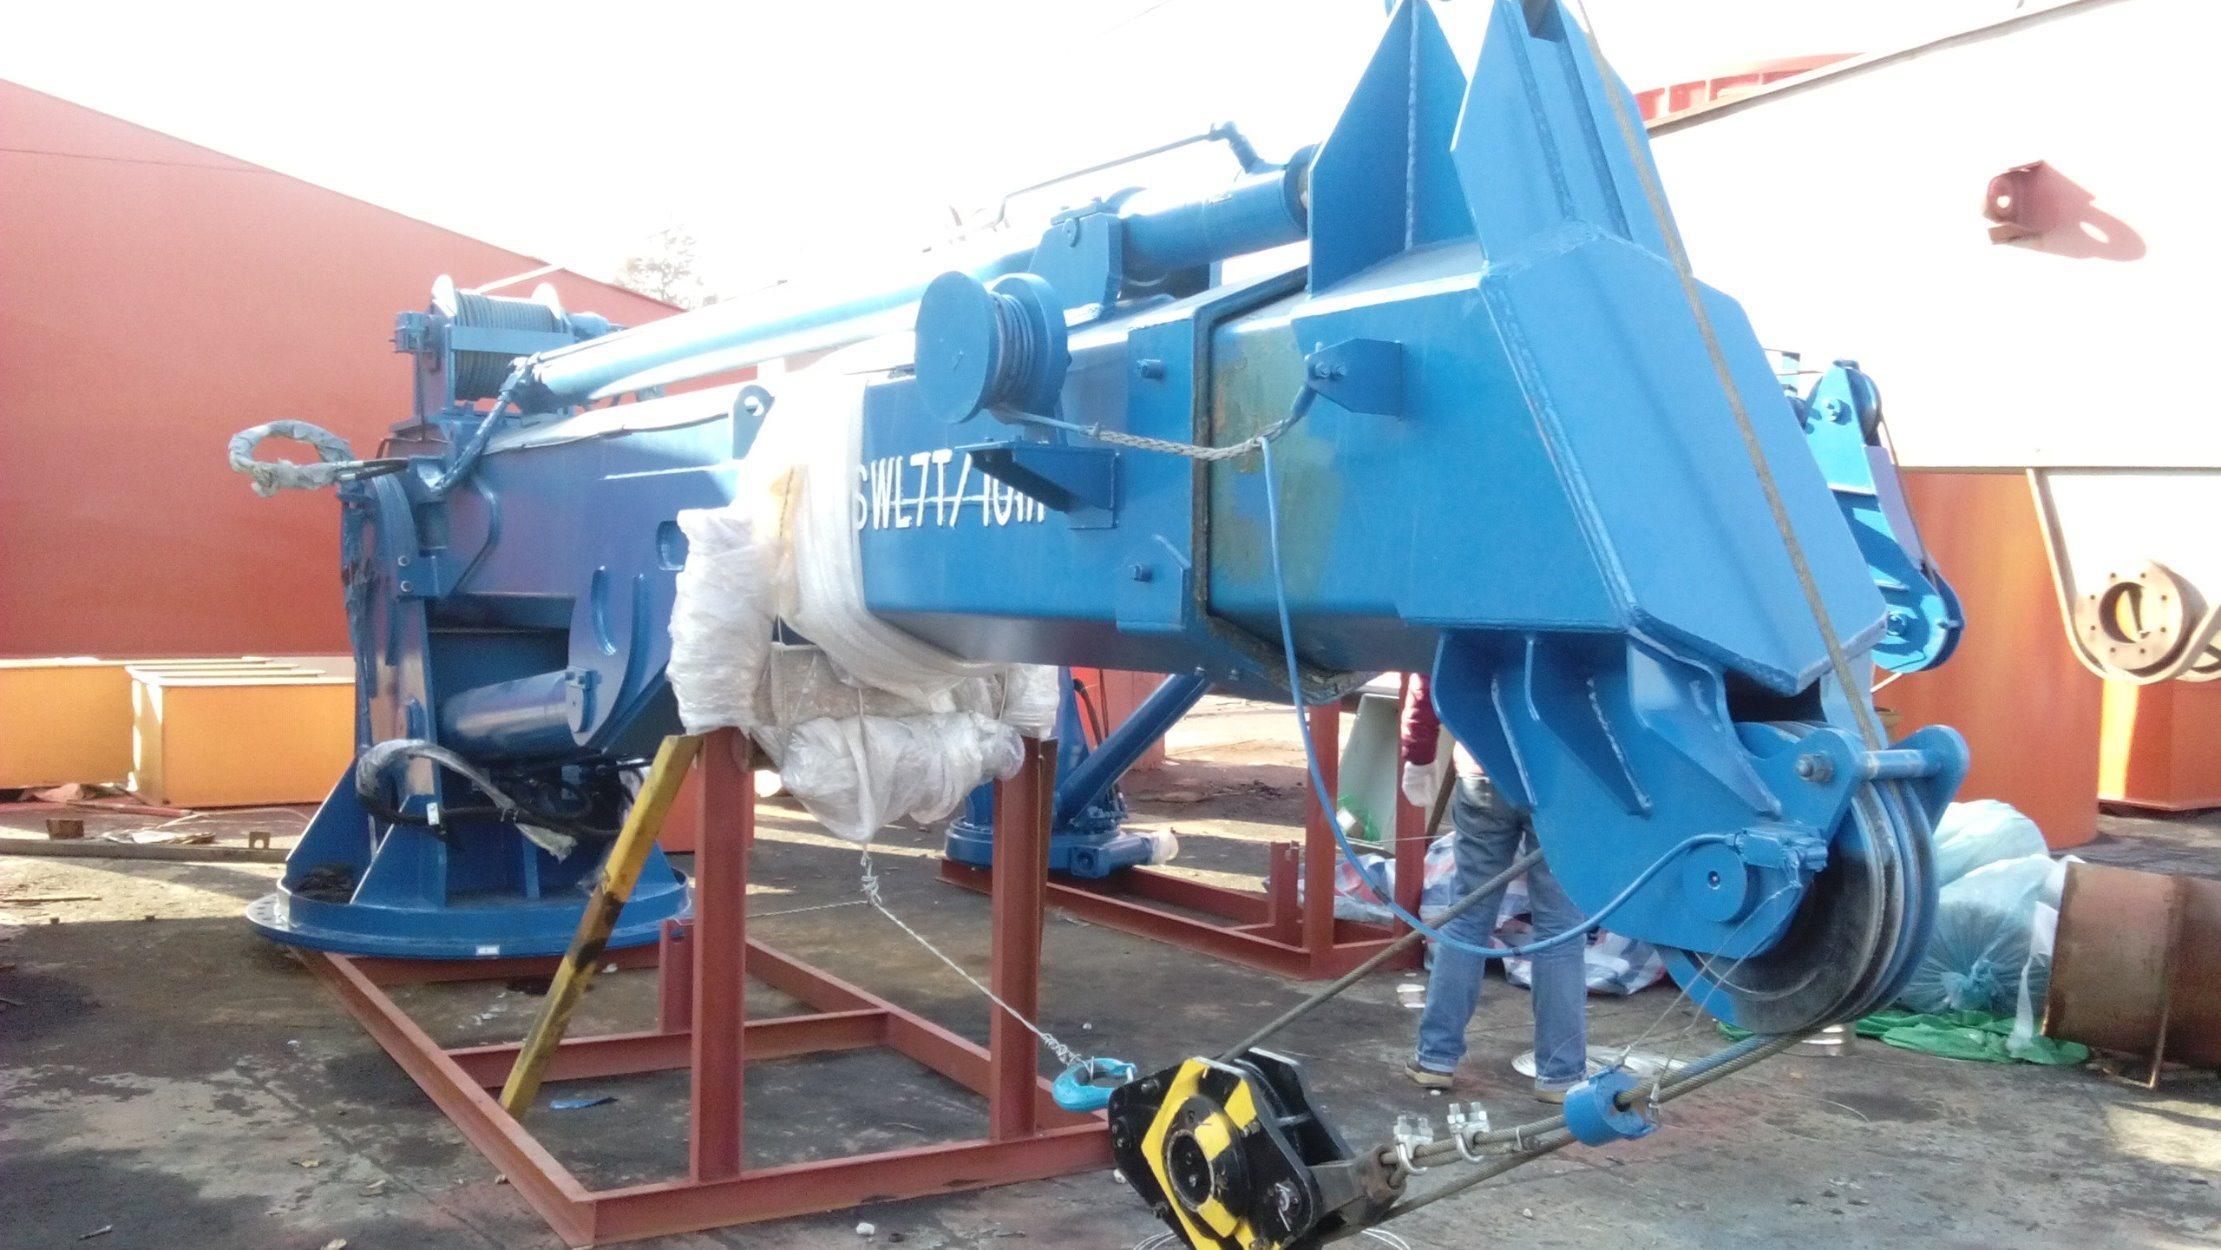 [Hot Item] 1 Ton/3 Ton/7 Ton Telescopic Boom Hydraulic Marine Deck Crane  for Sale